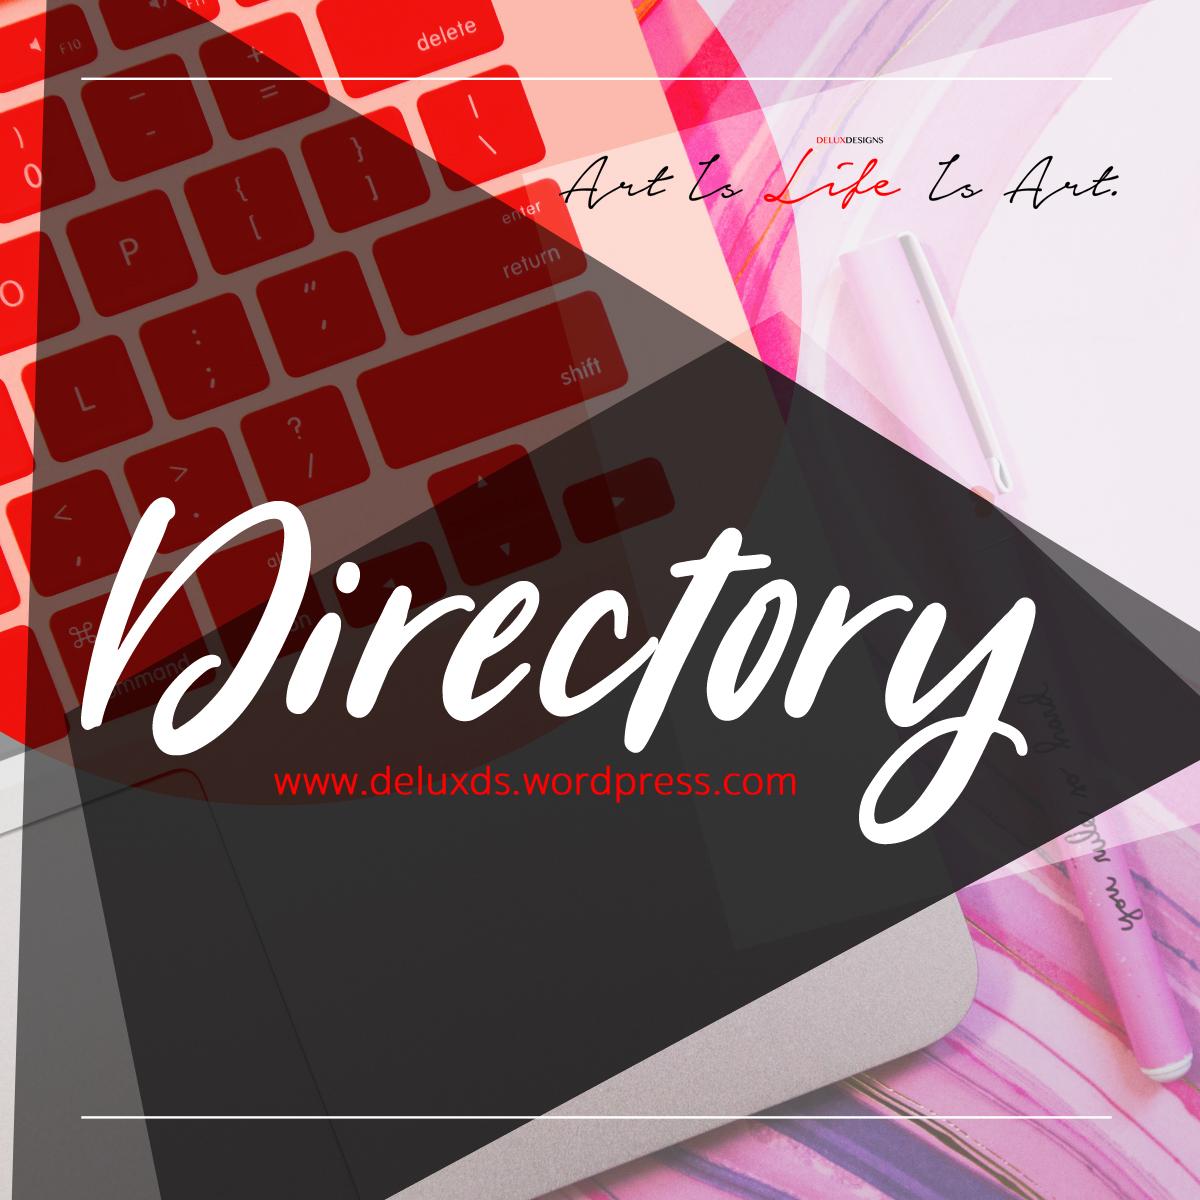 DE Directory - Webpages